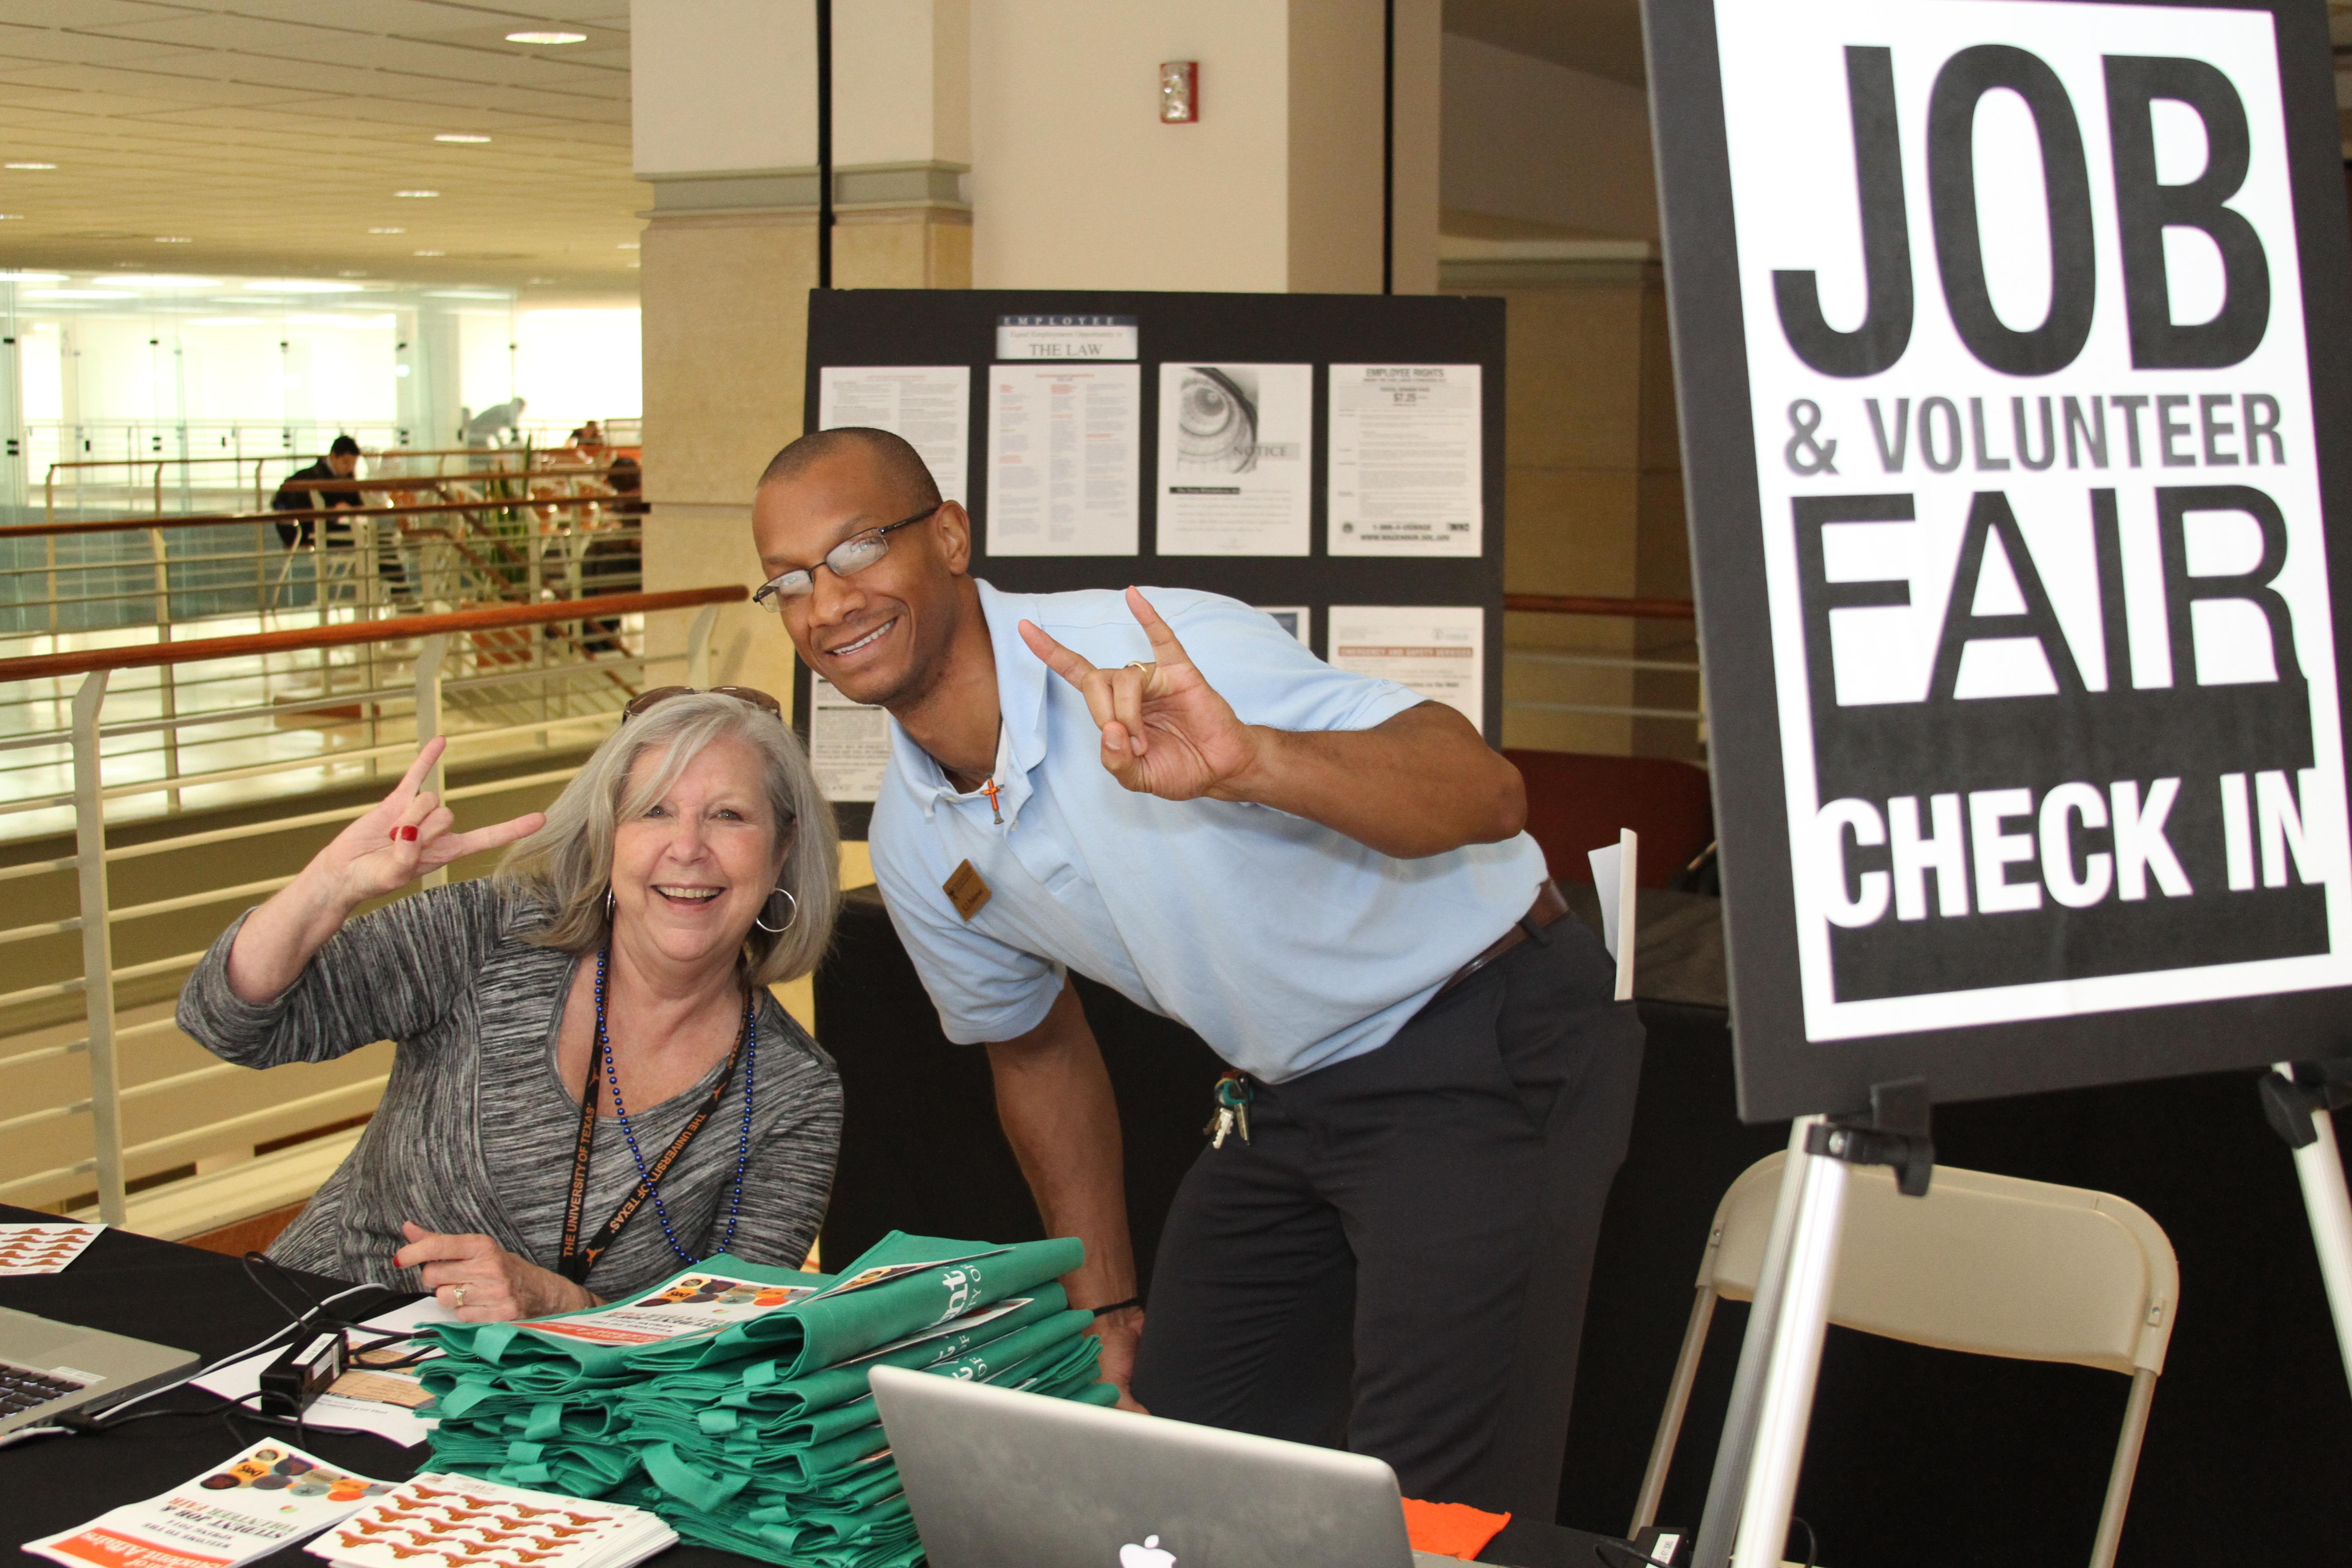 Mitzi Henry & EJ Patterson at the Student Job & Volunteer Fair